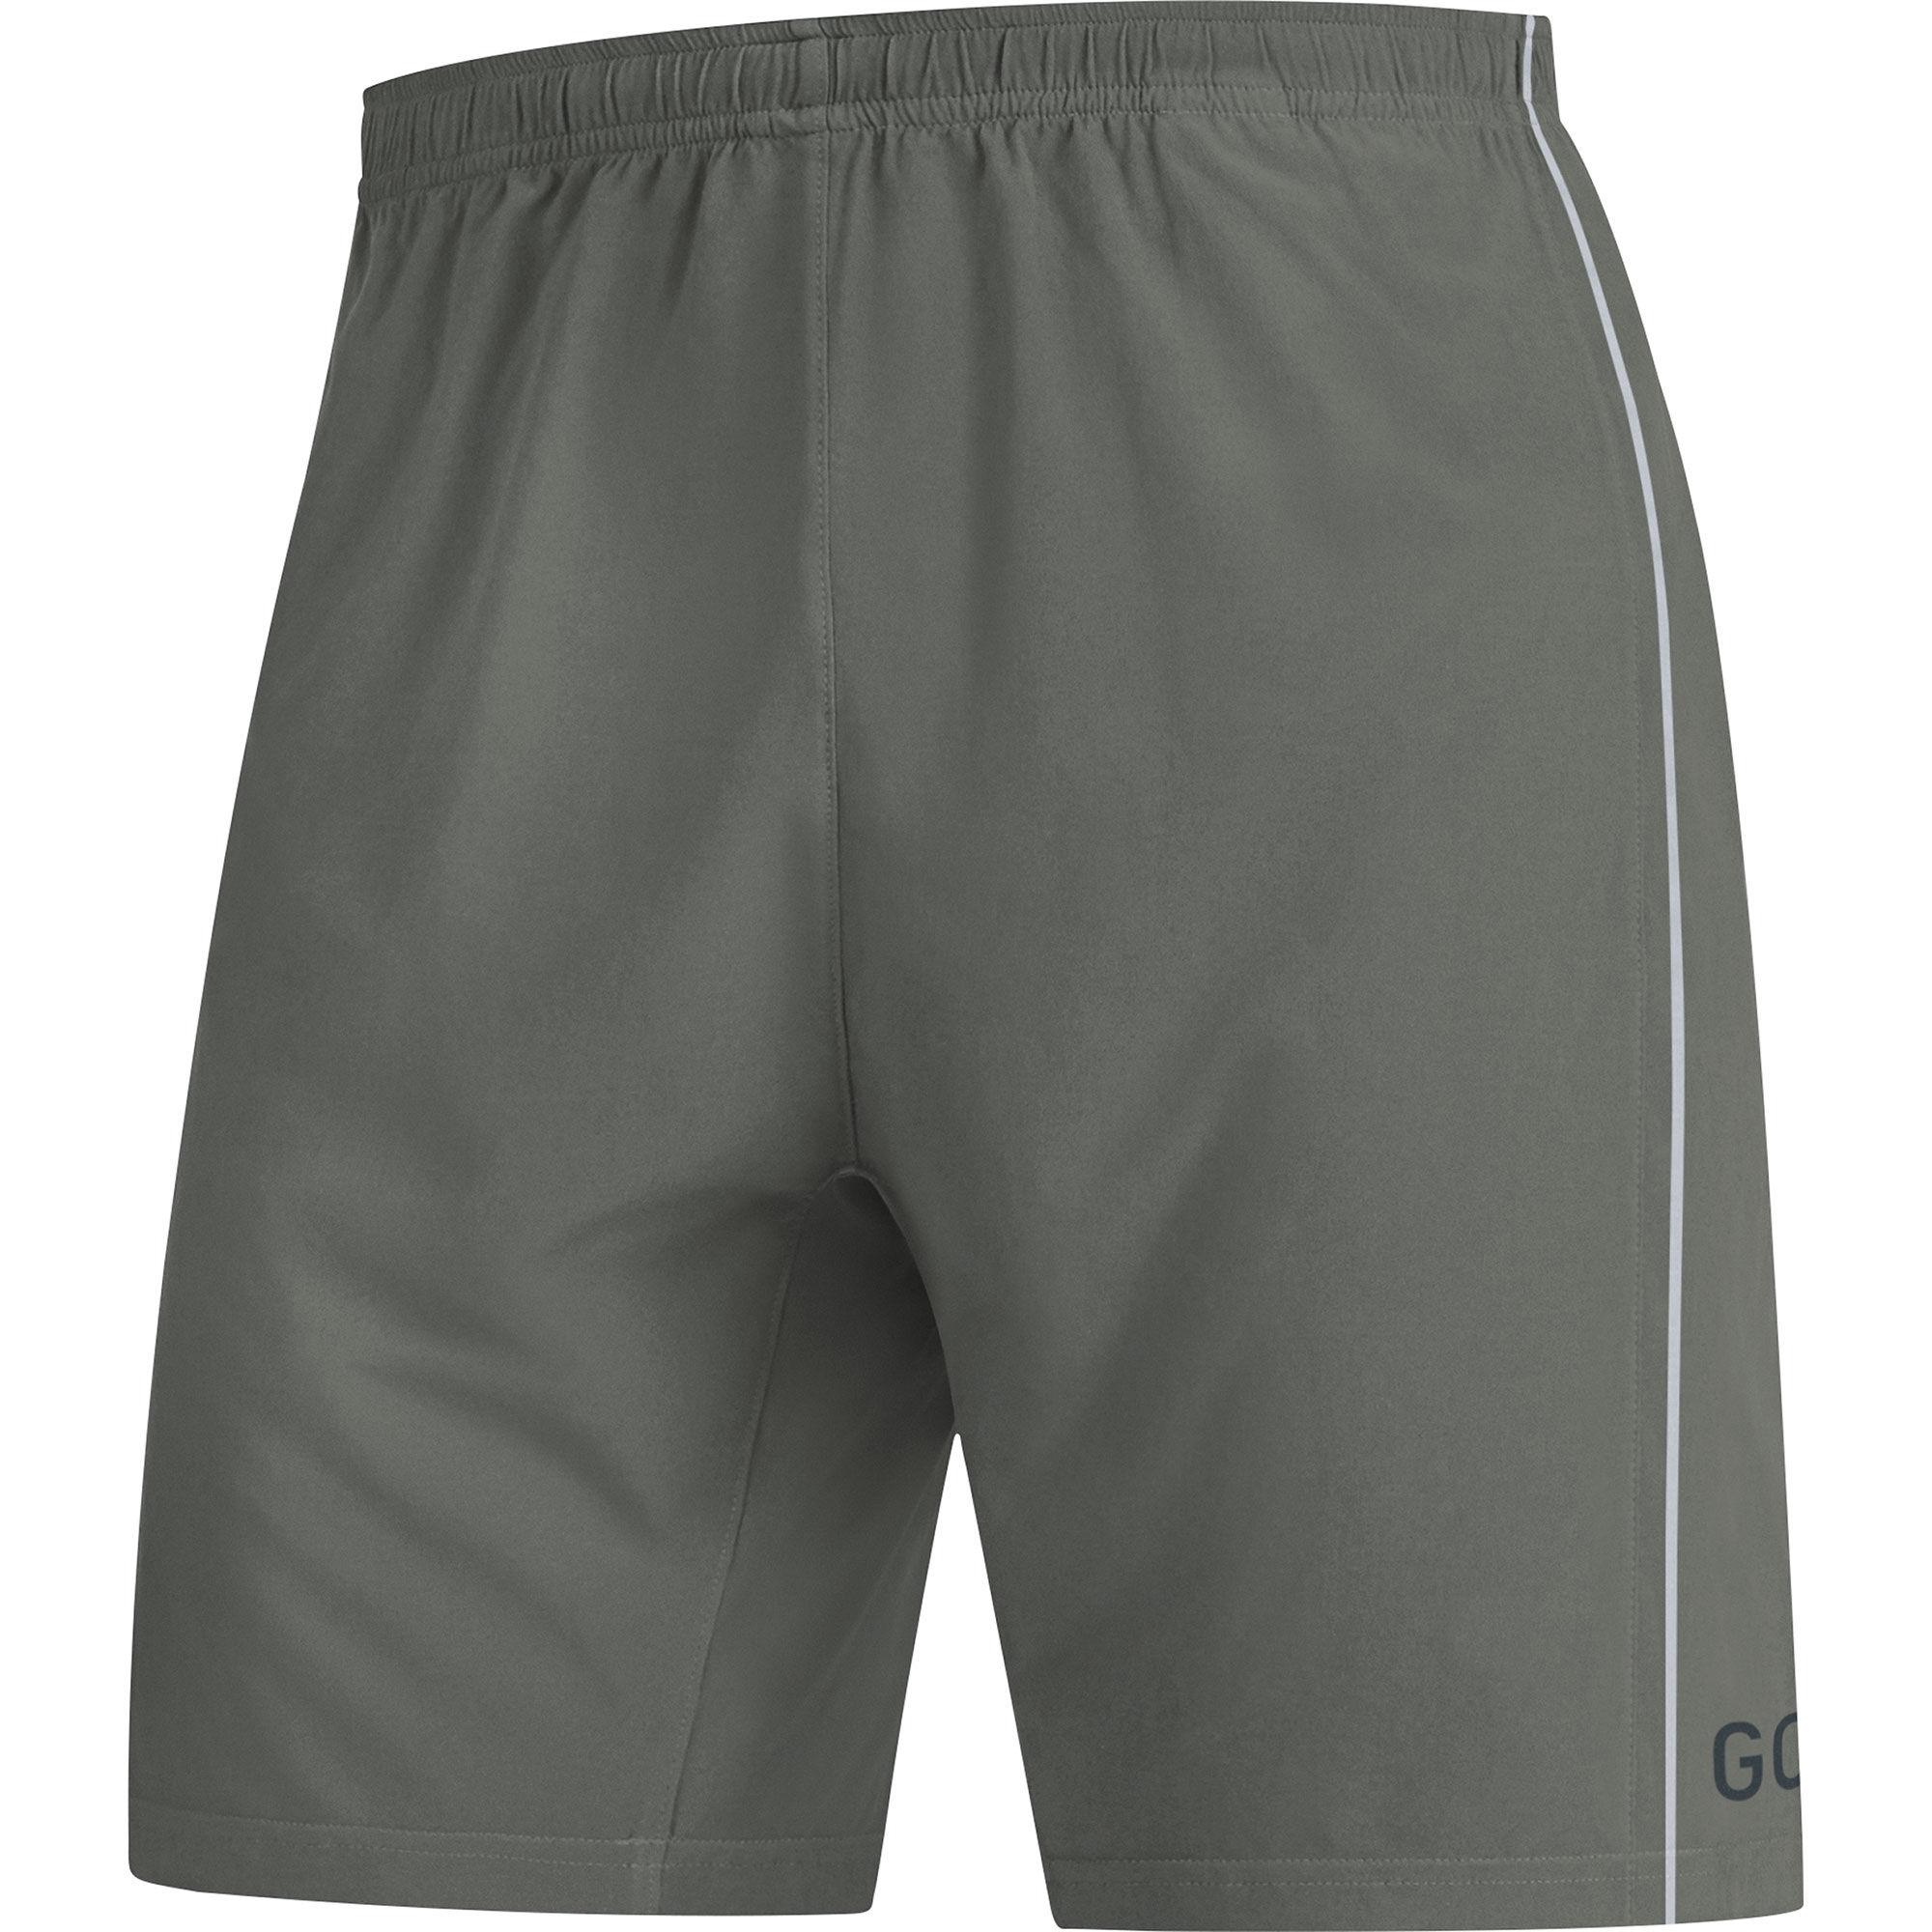 Gore R5 Light Shorts in Grau